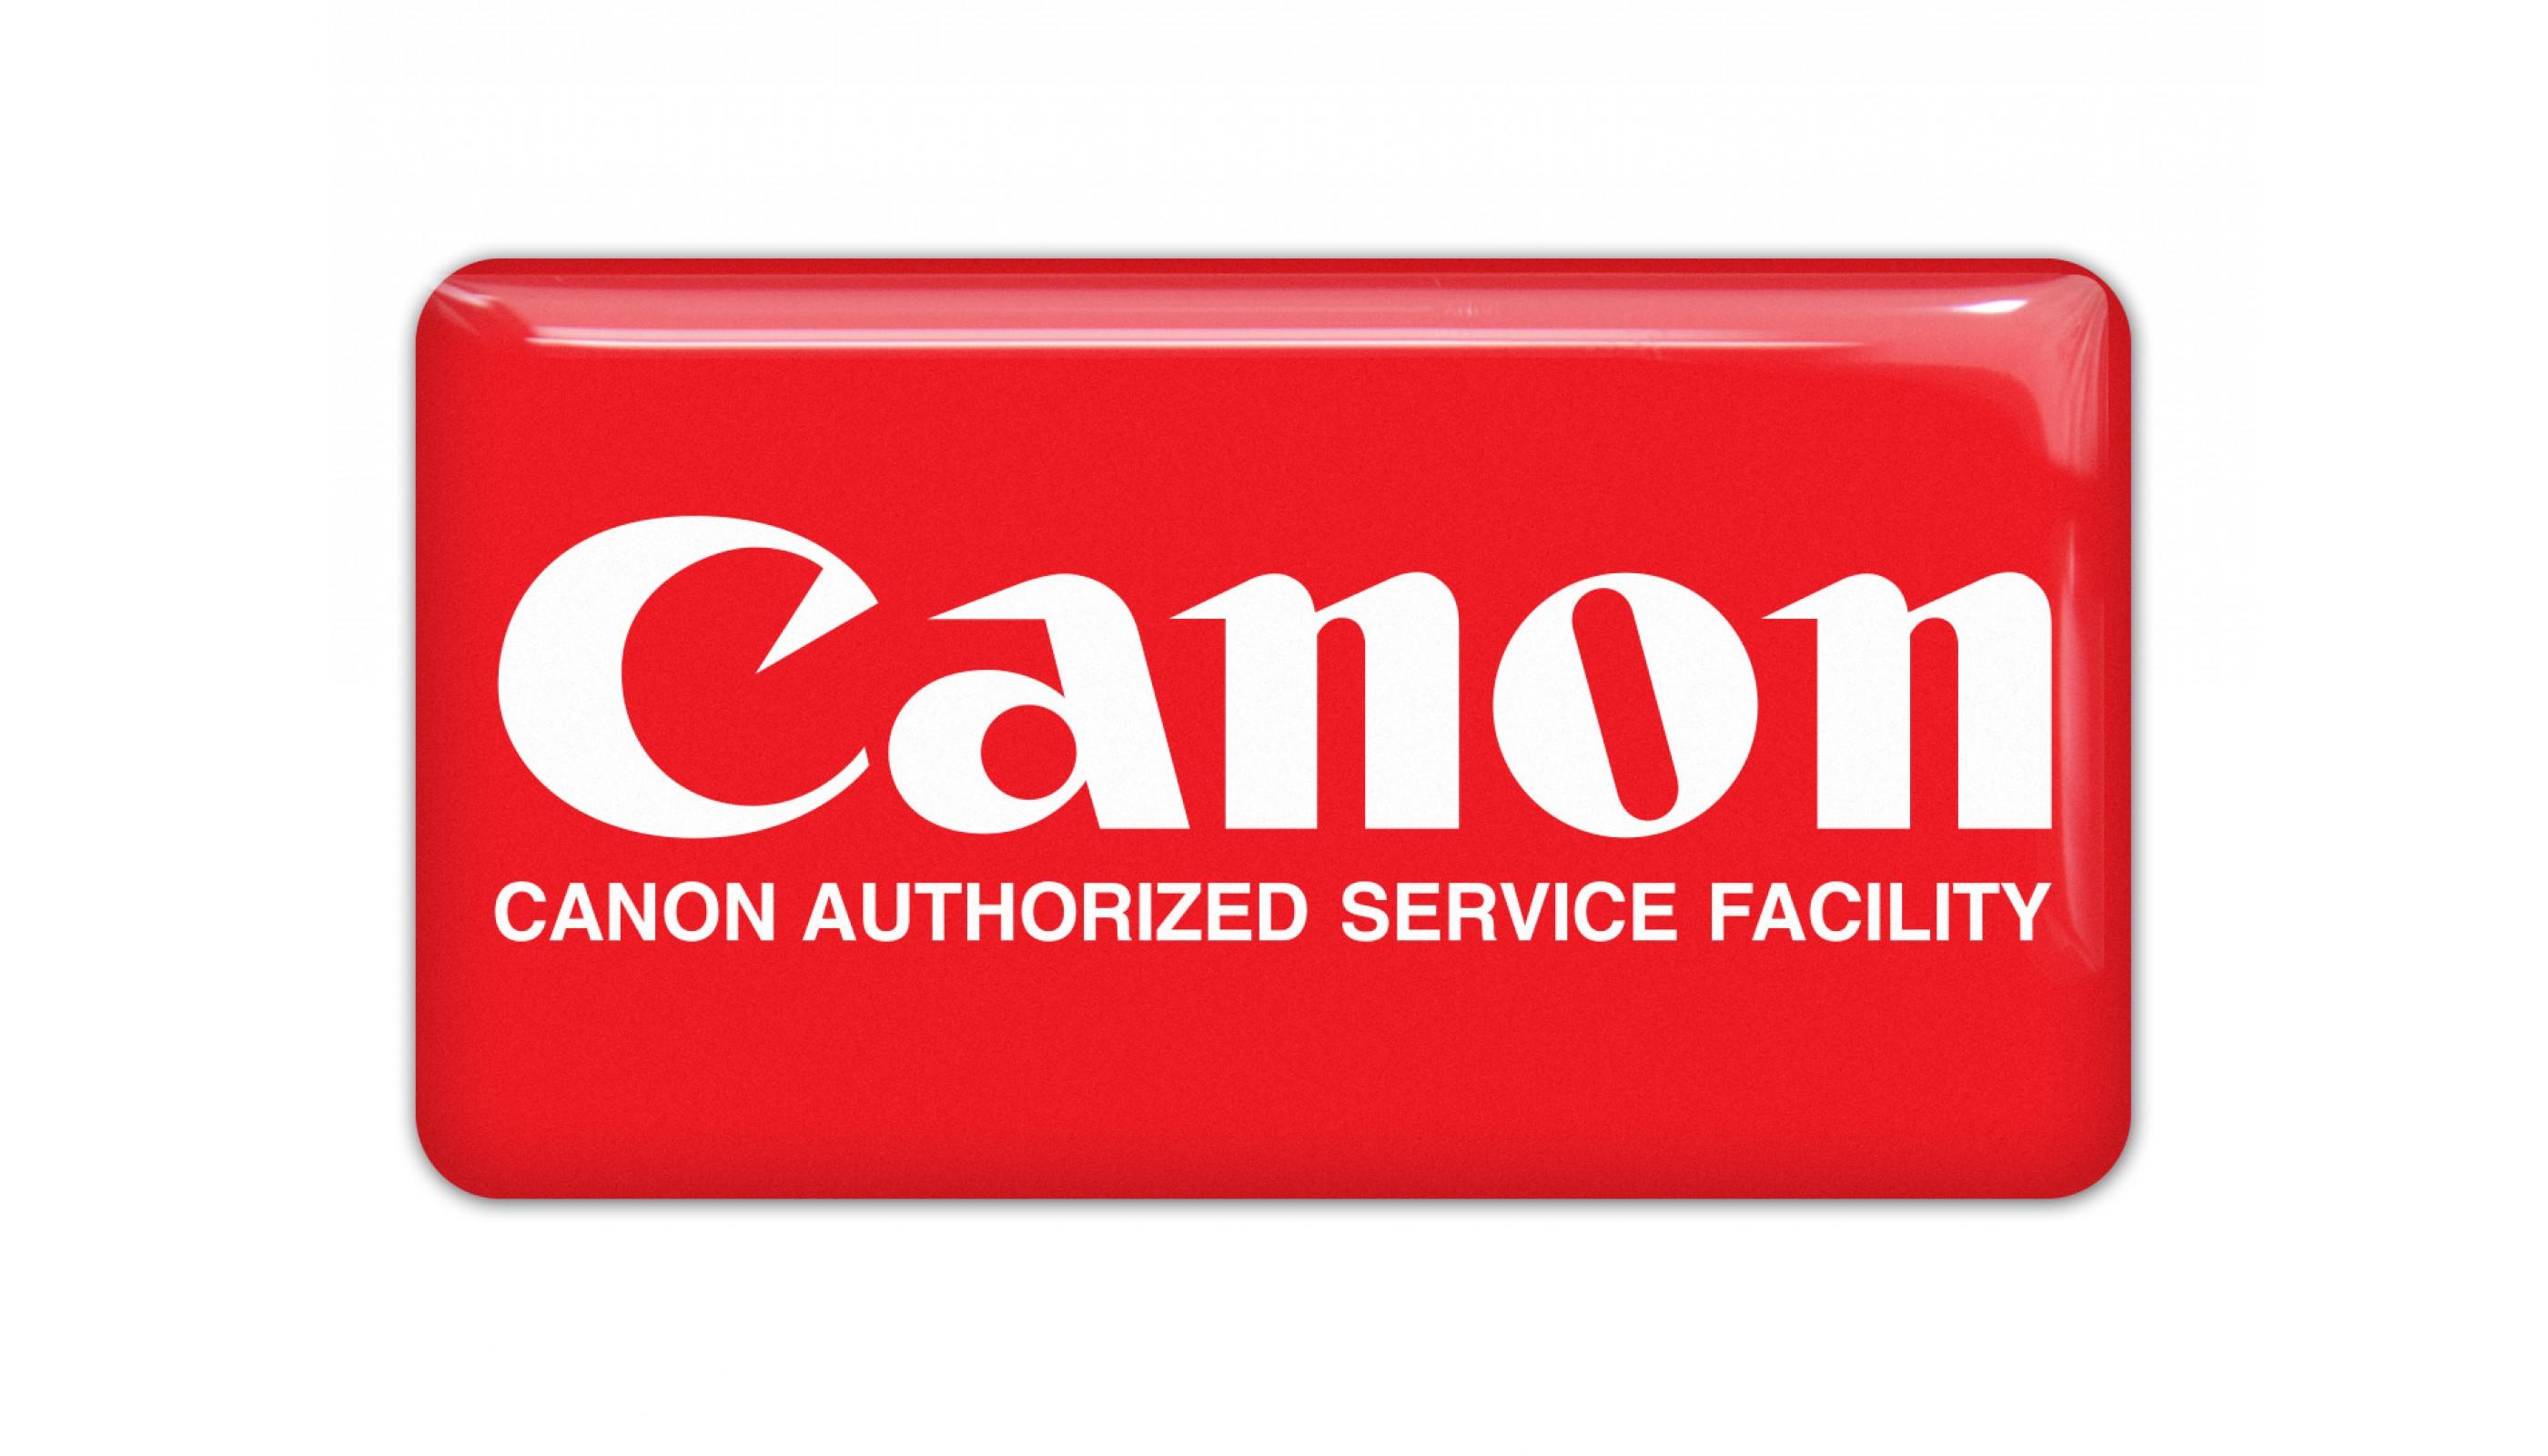 Canon Authorised Service